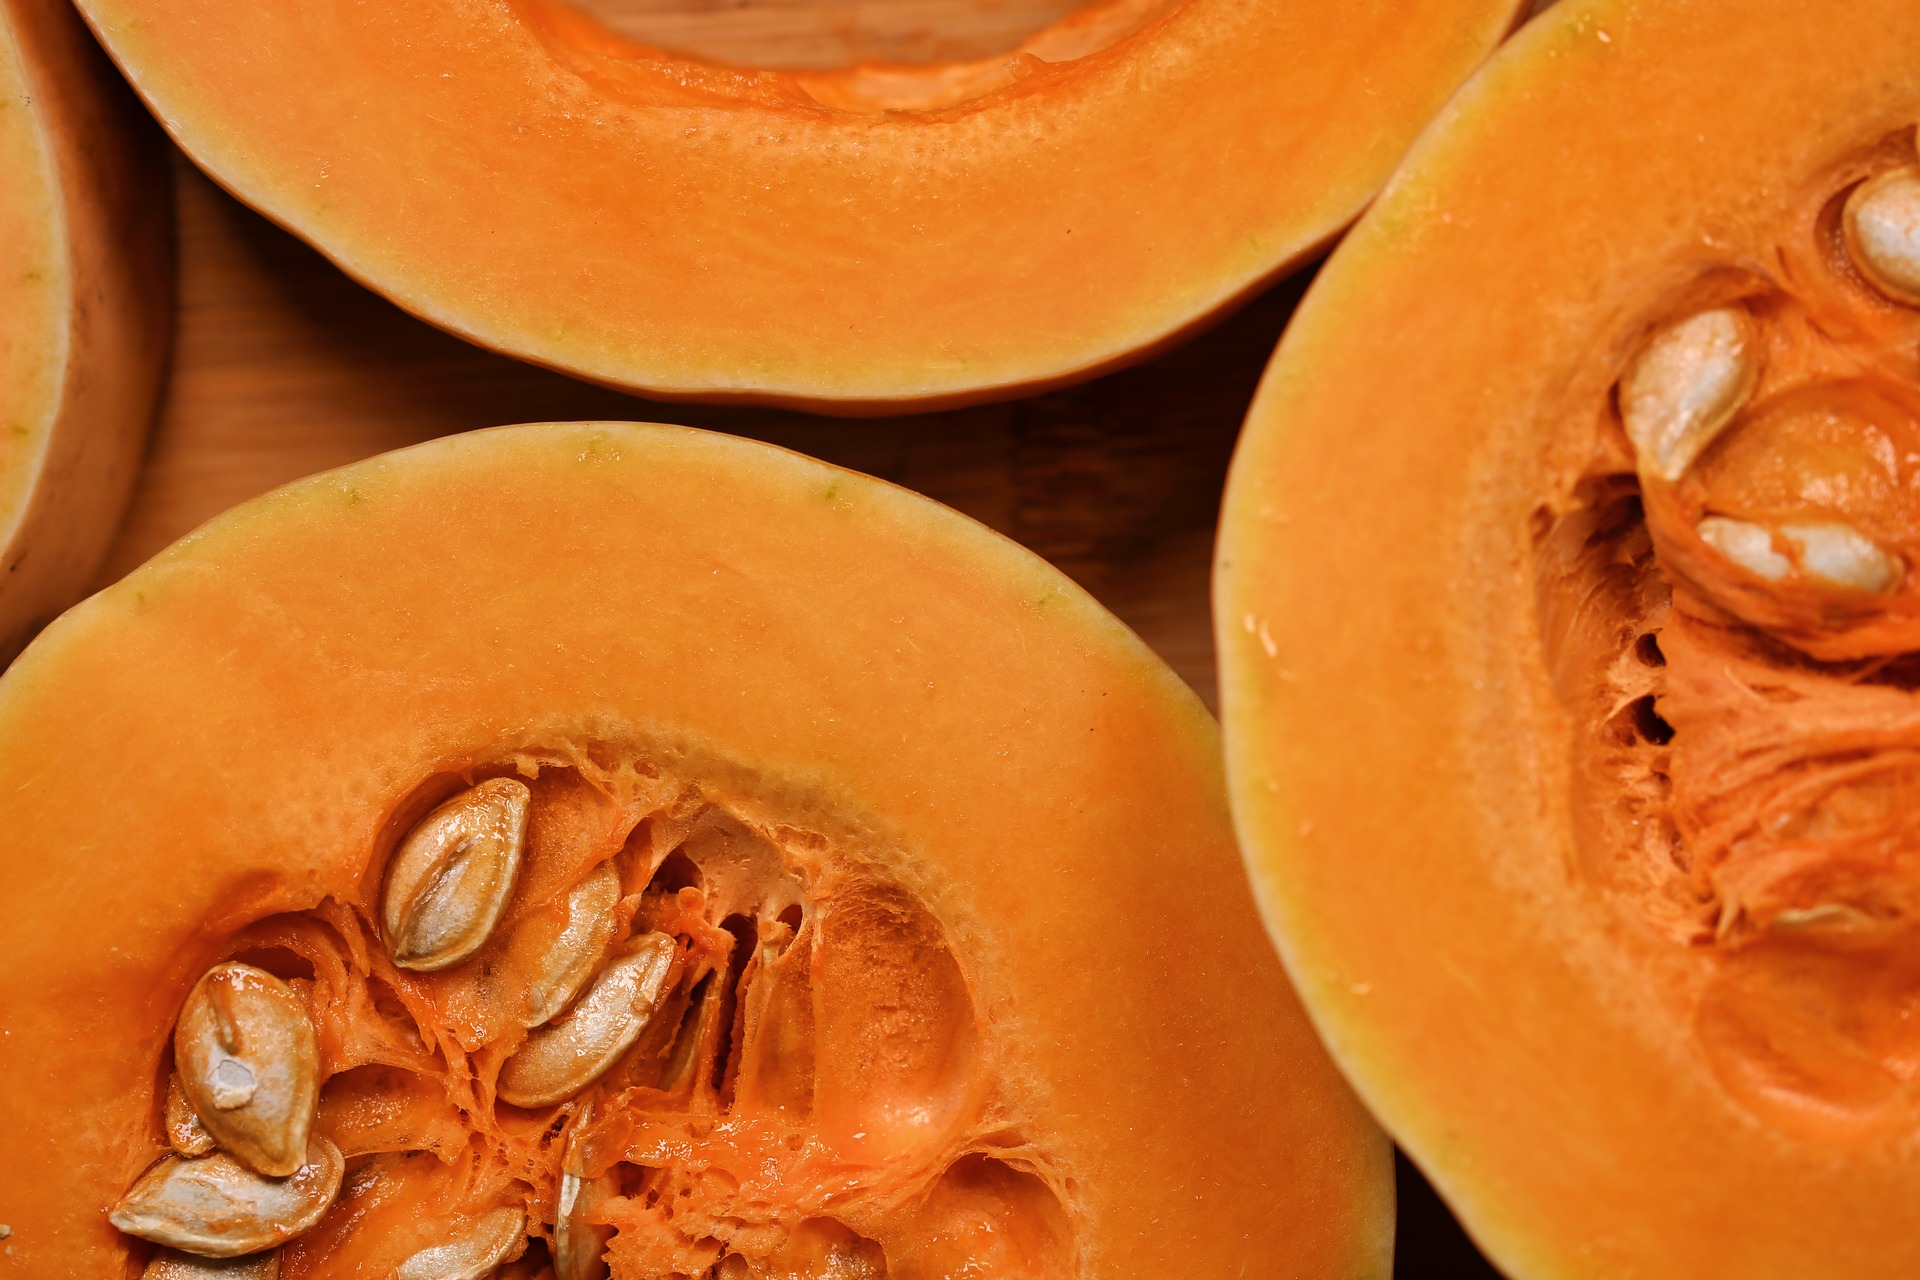 Pumpkins cut in half